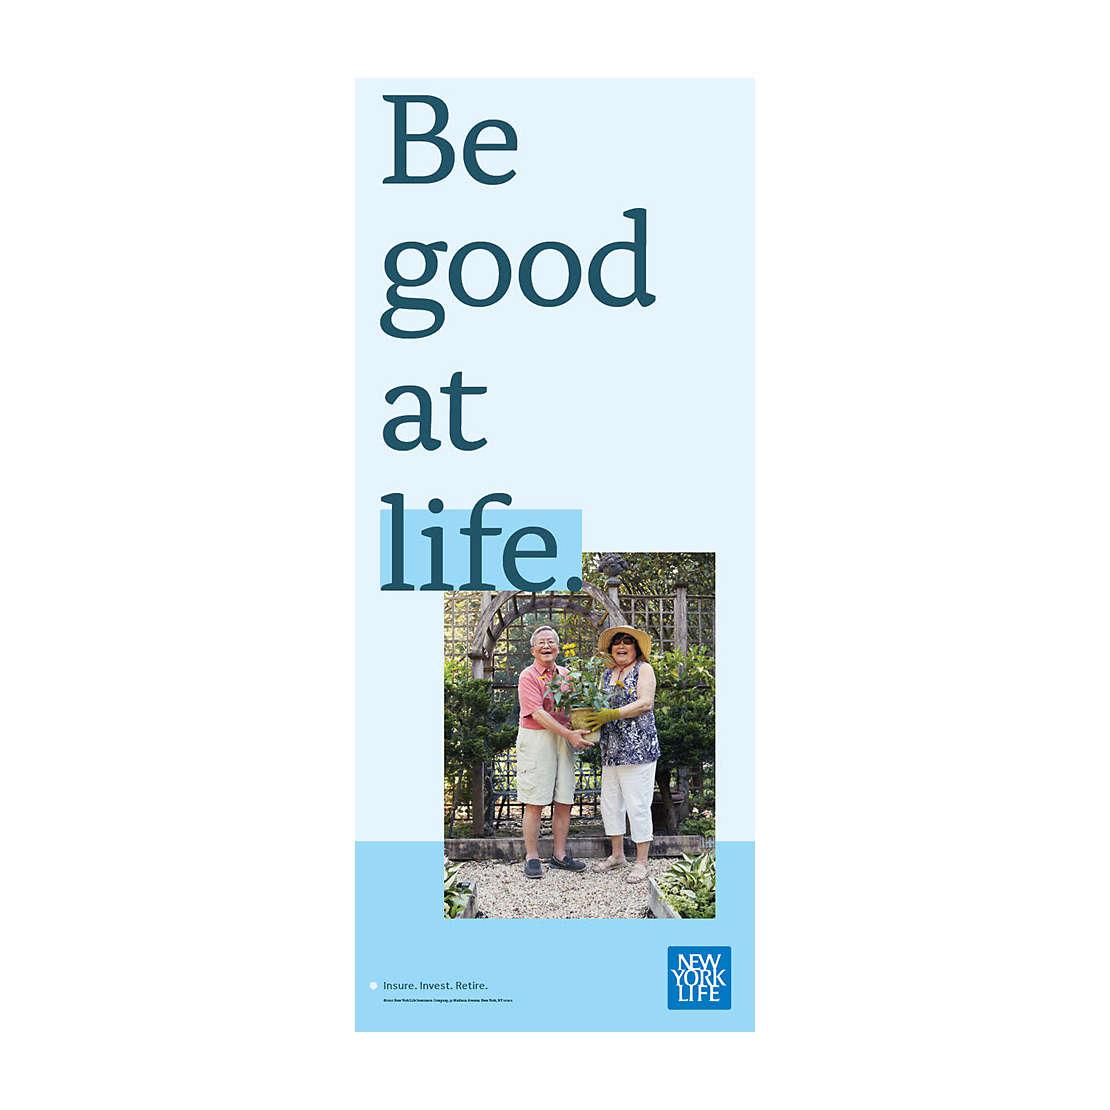 new york life brochure